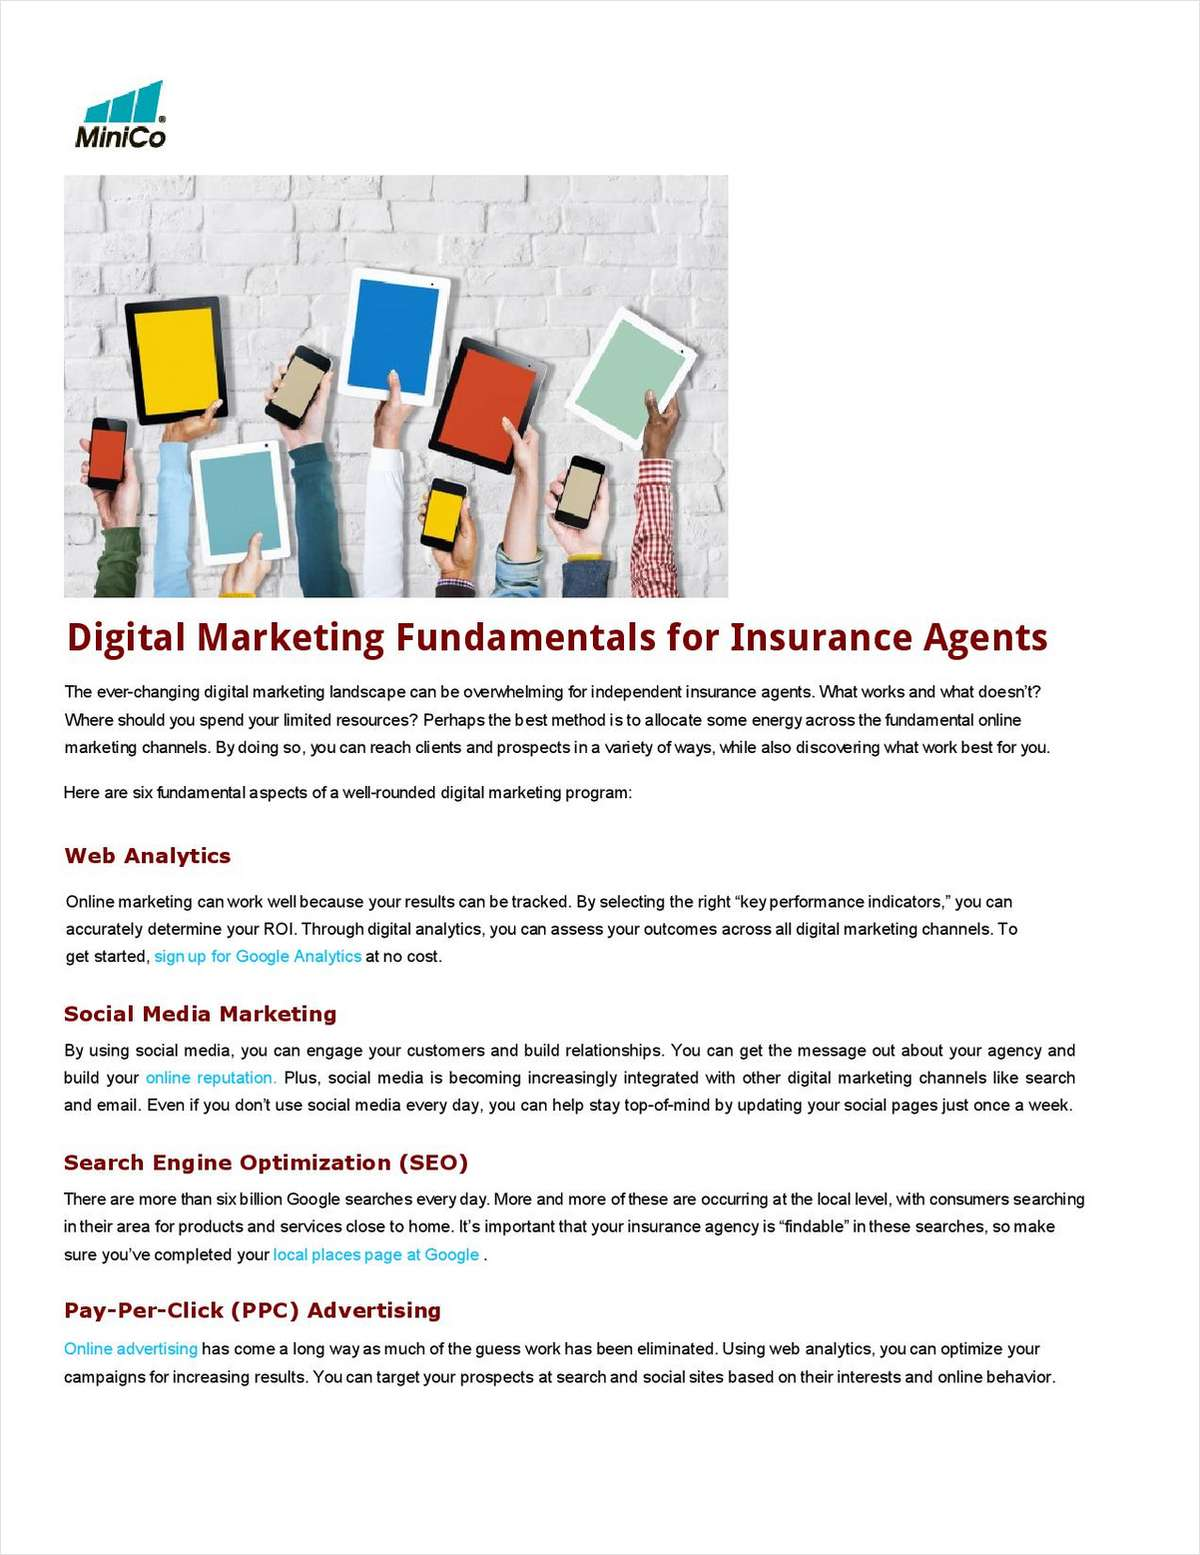 Digital Marketing Fundamentals for Insurance Agents